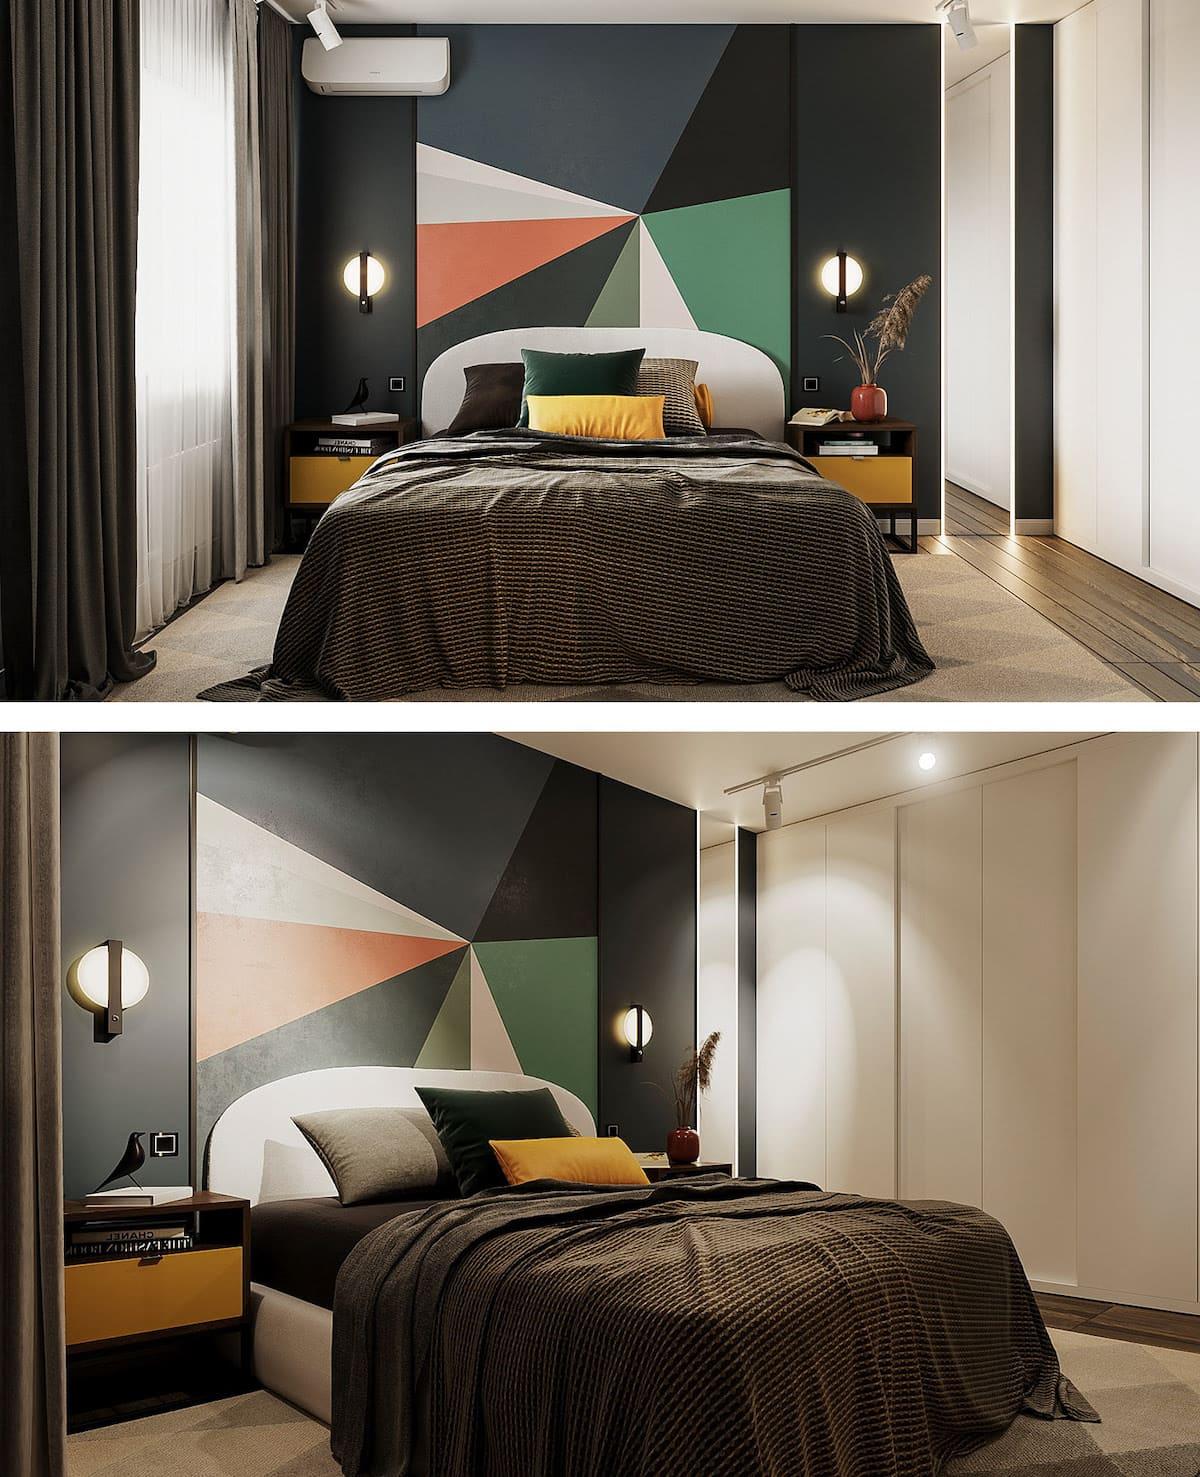 дизайн однокомнатной квартиры фото 55